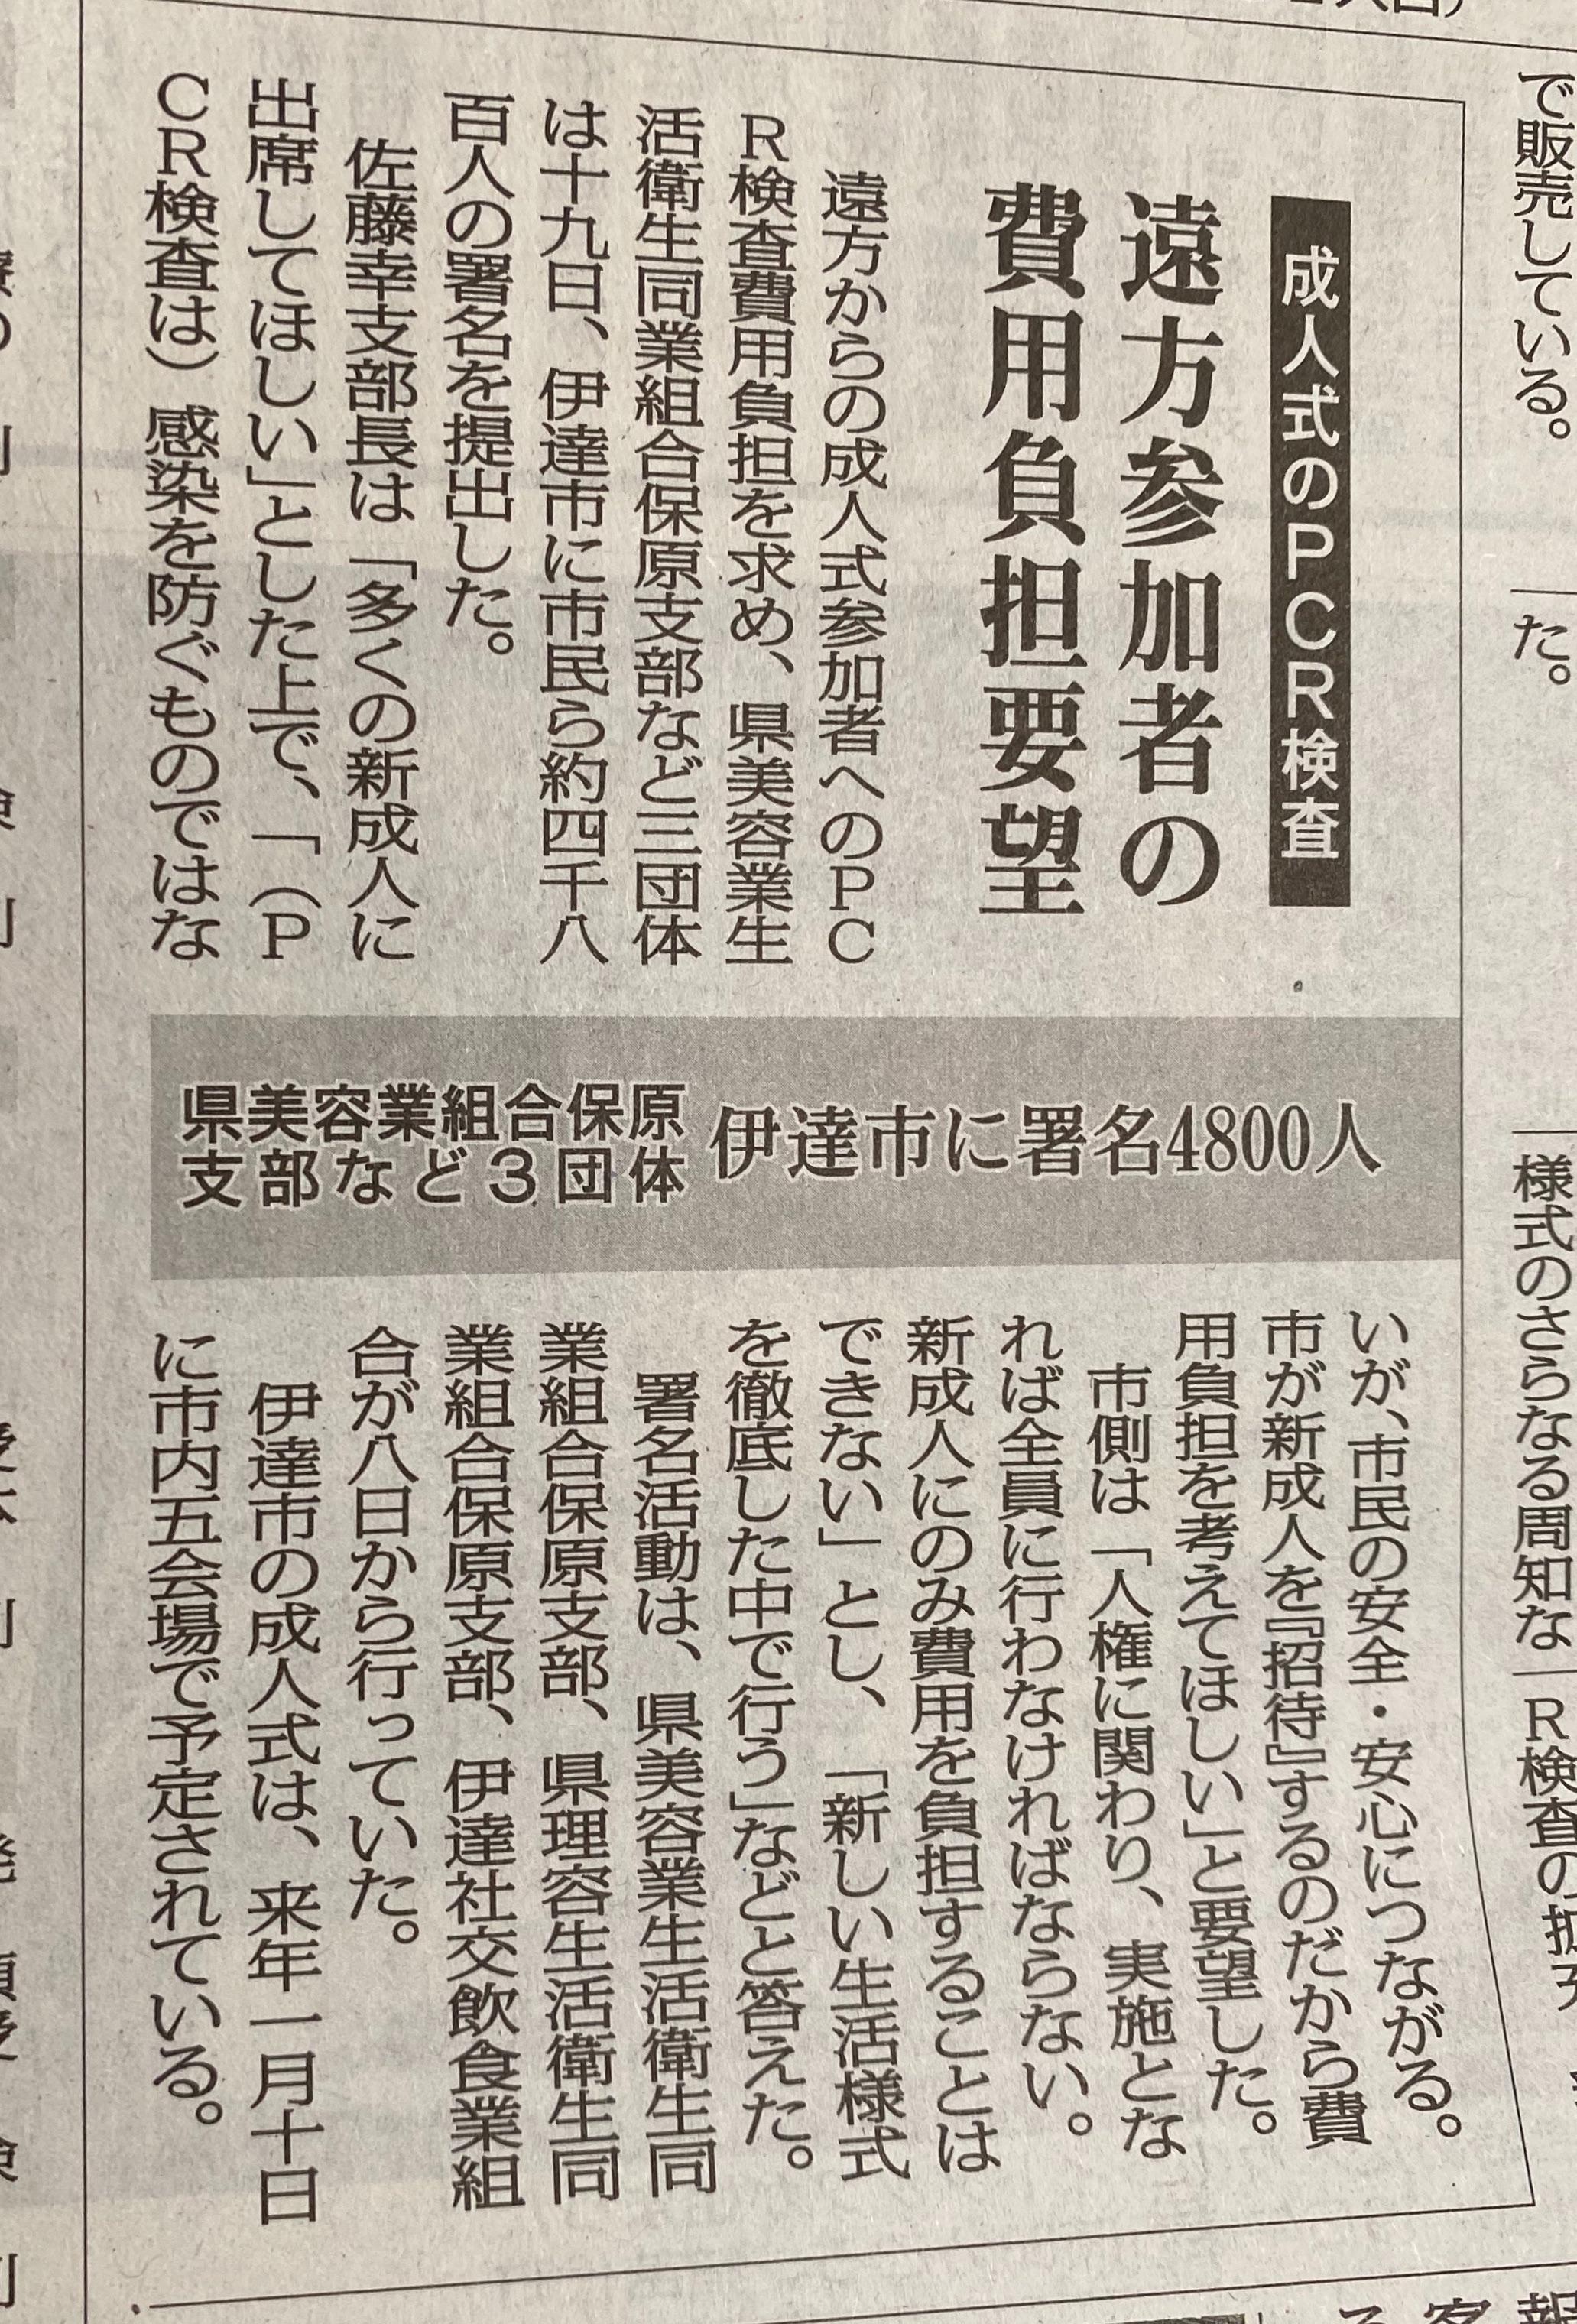 f:id:oohashisaori:20201031082440j:image